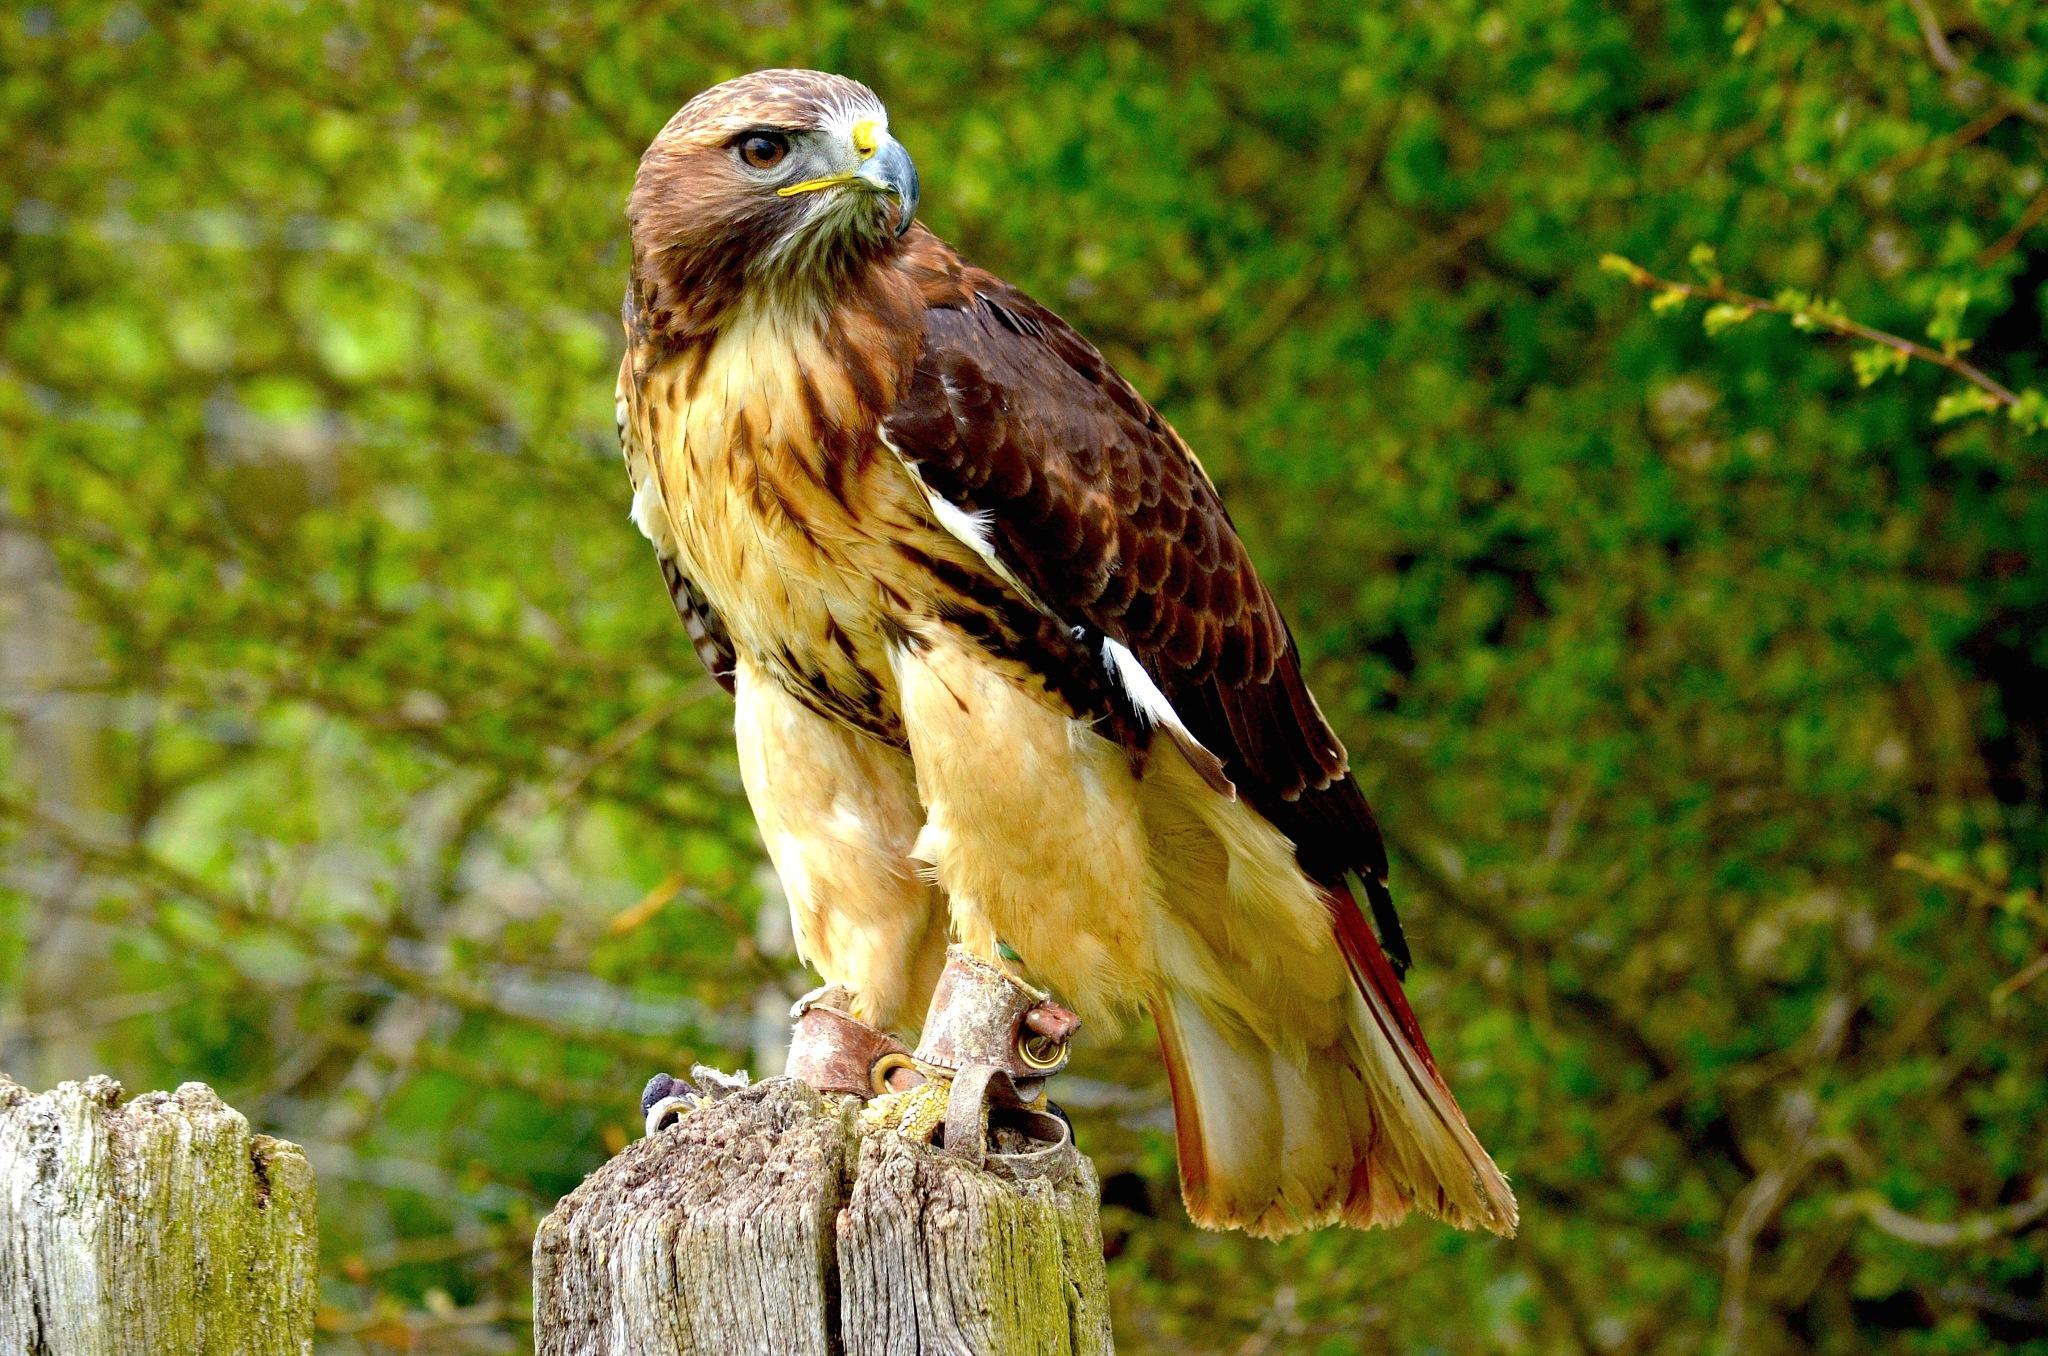 Birds of Prey. by John Cater